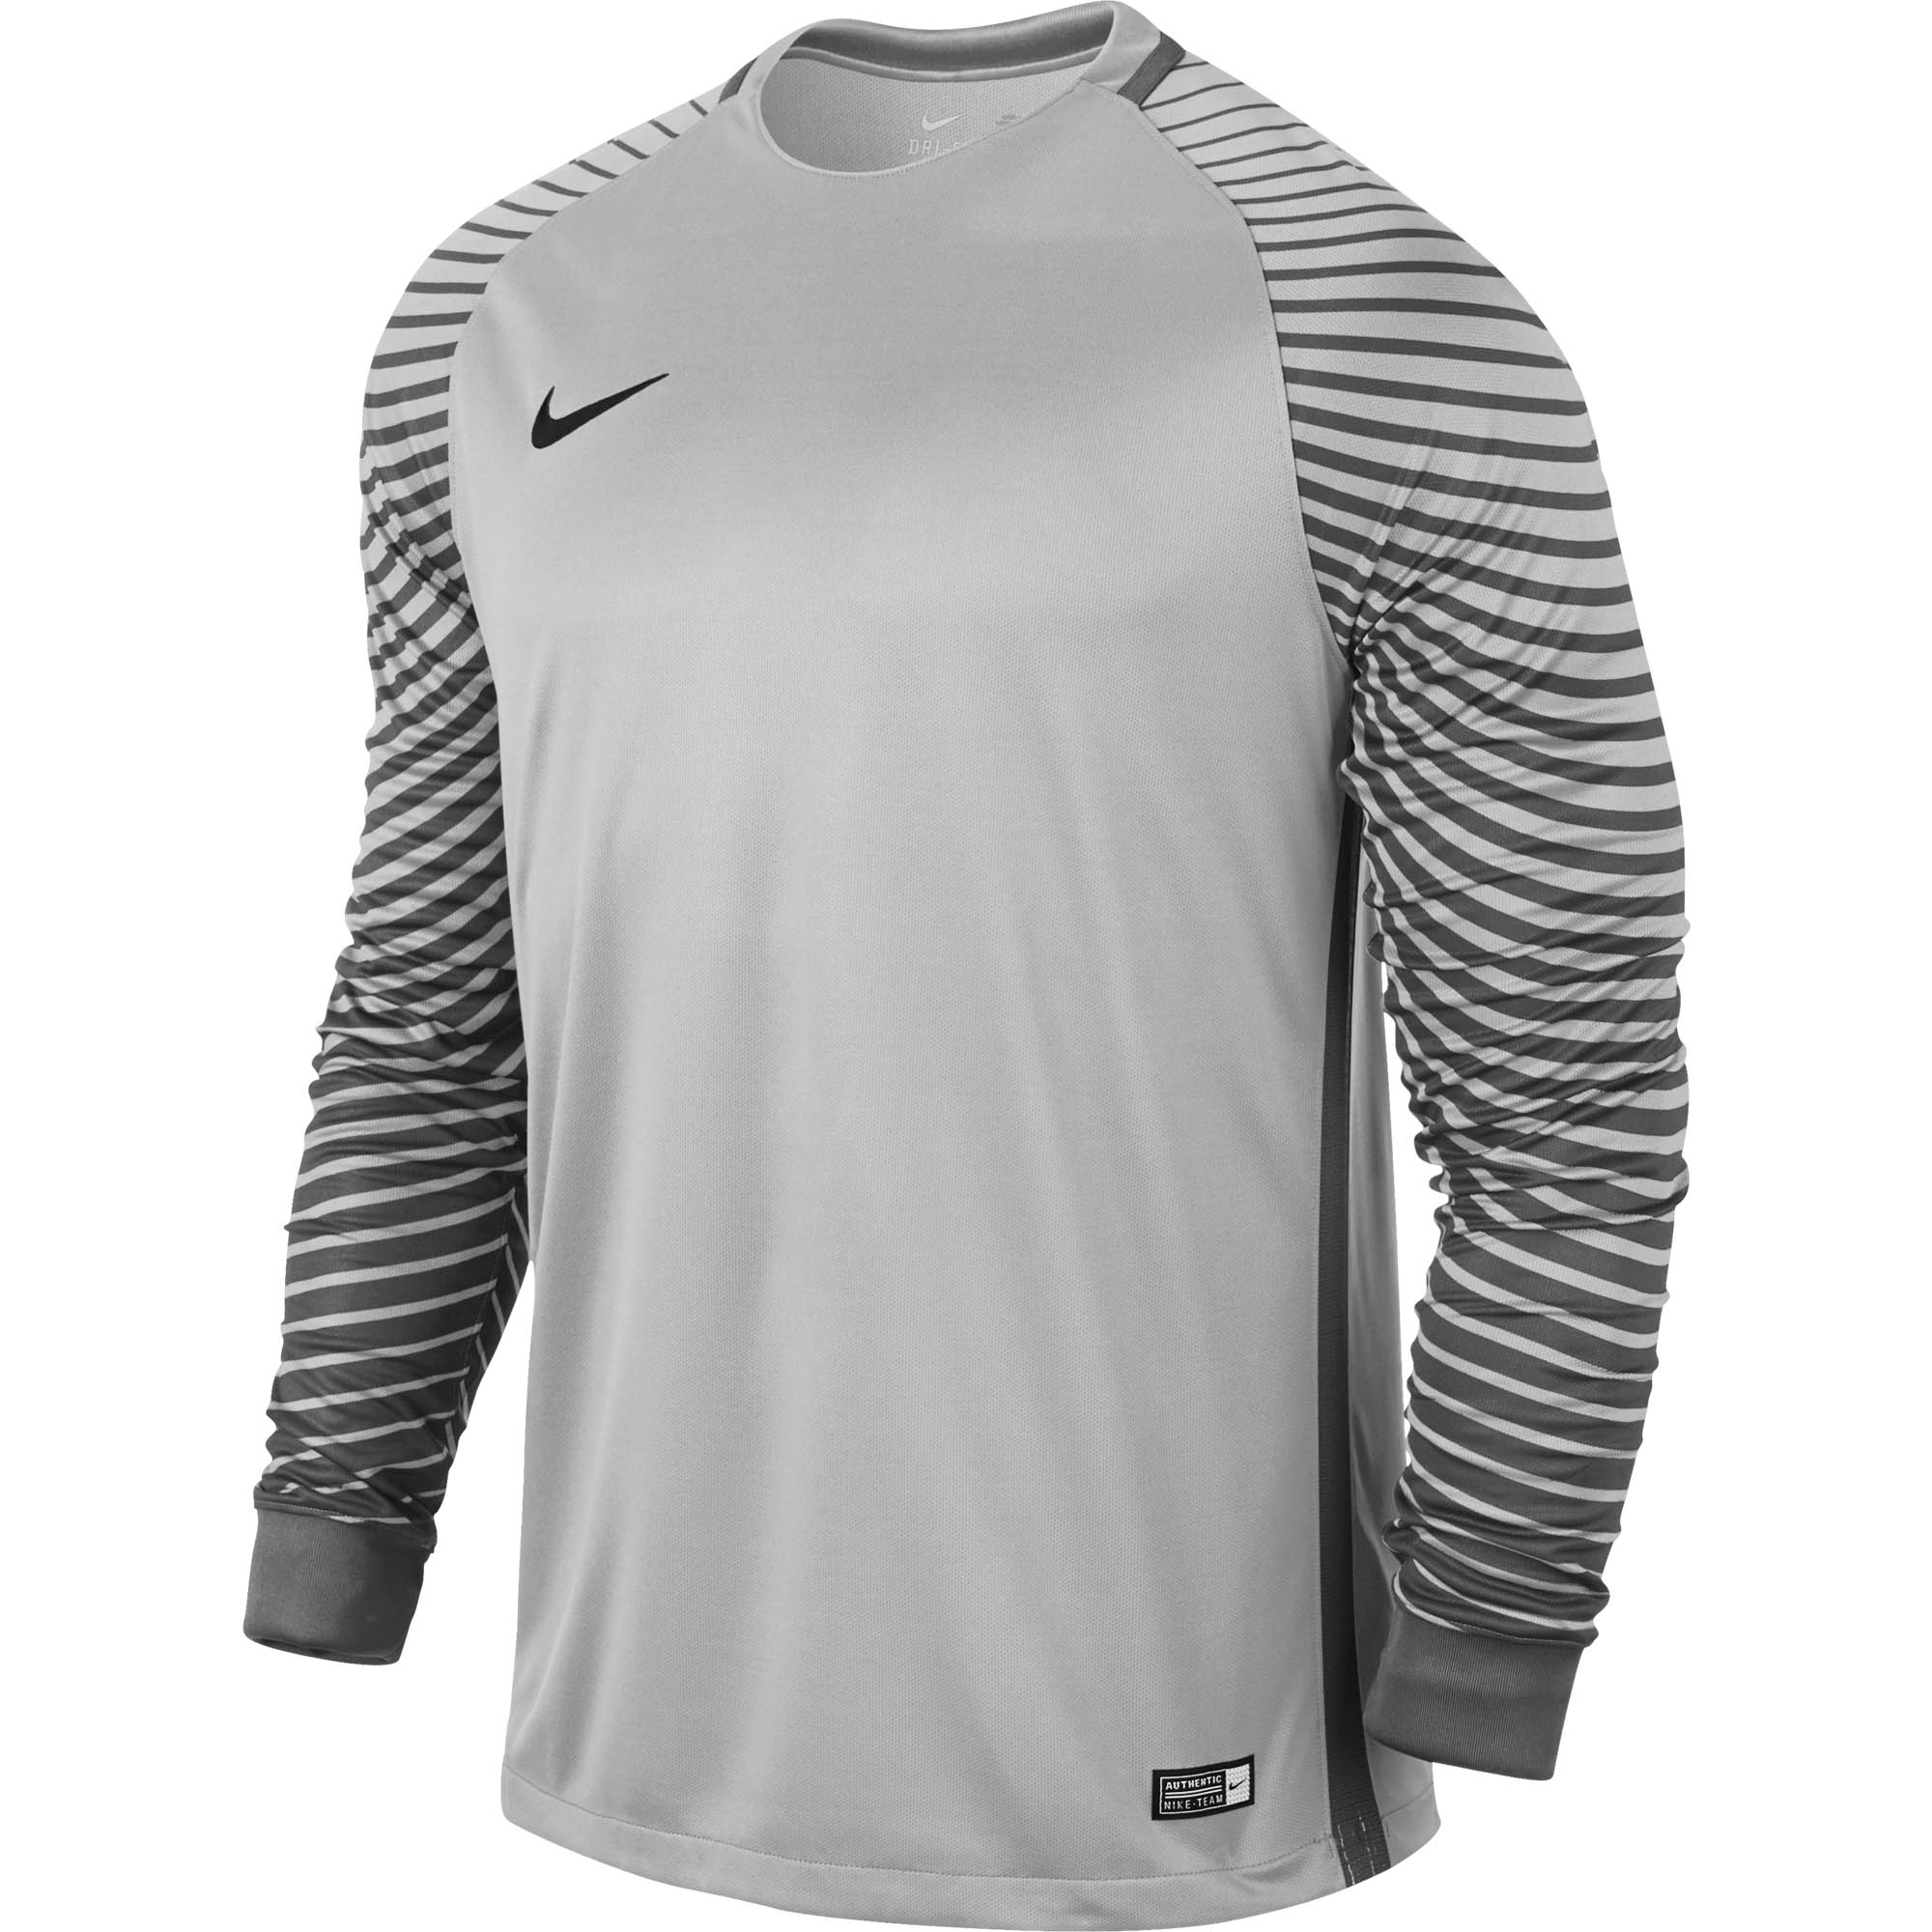 the latest faa4e 6b968 Nike Gardien Goalkeeper Jersey – Pure Platinum Cool Grey